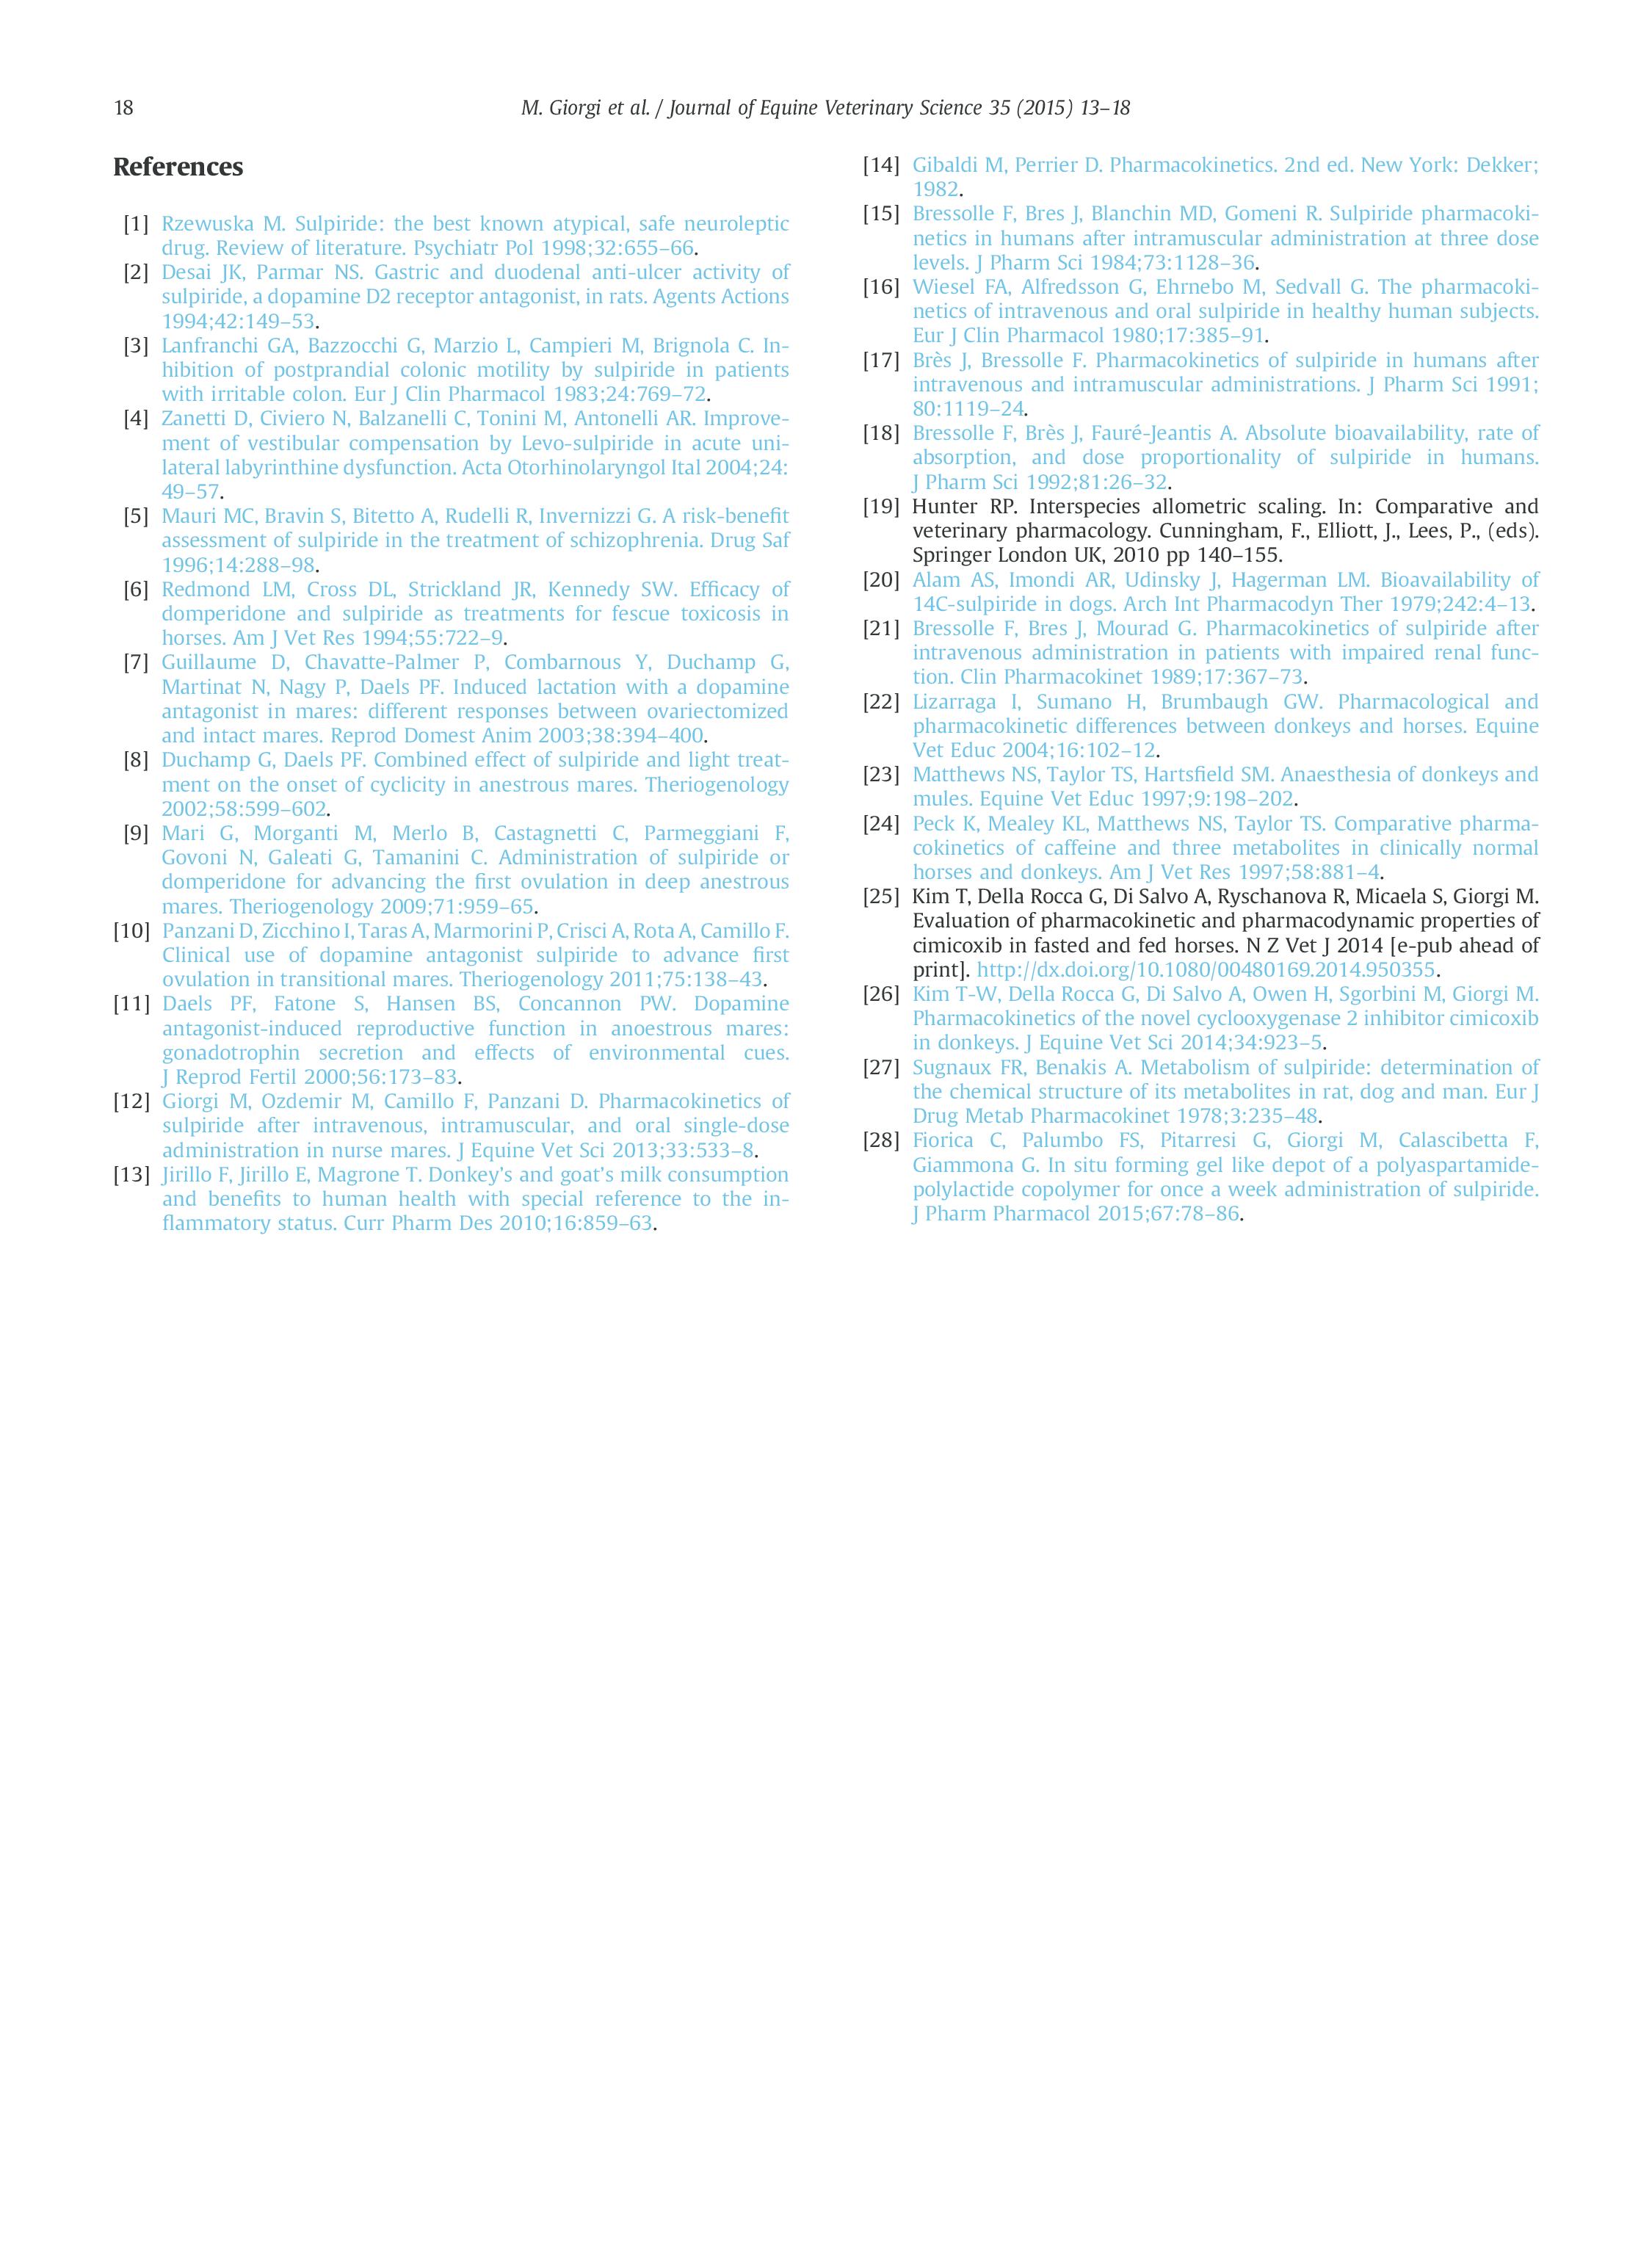 pharmacokinetic_jenniesrepro_ovulation-5.png